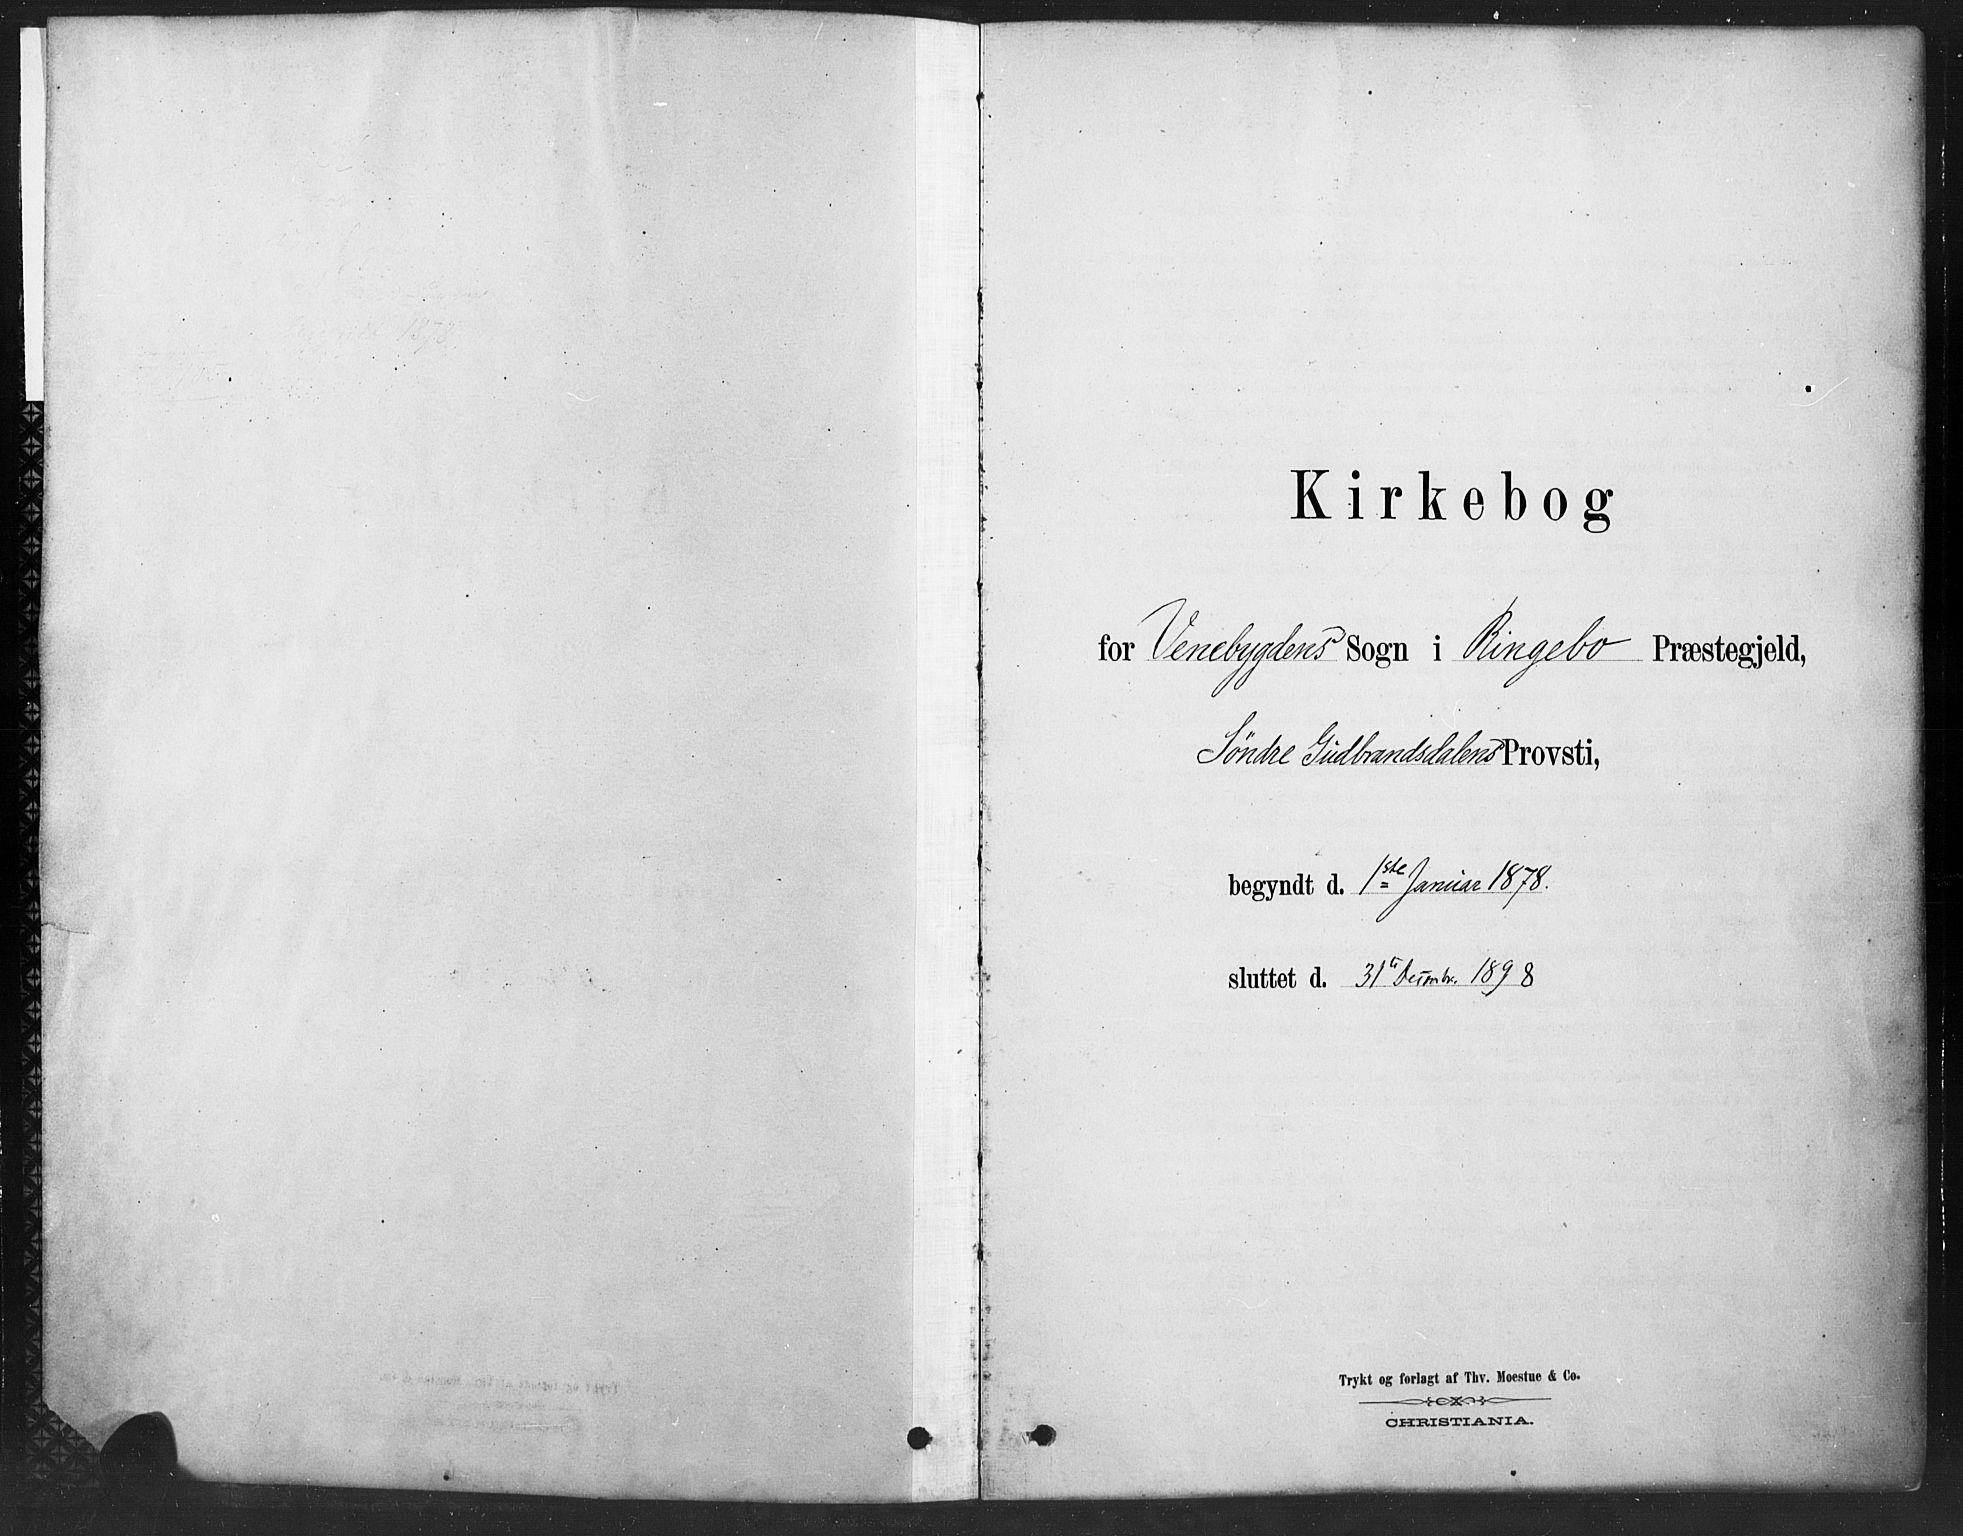 SAH, Ringebu prestekontor, Ministerialbok nr. 10, 1878-1898